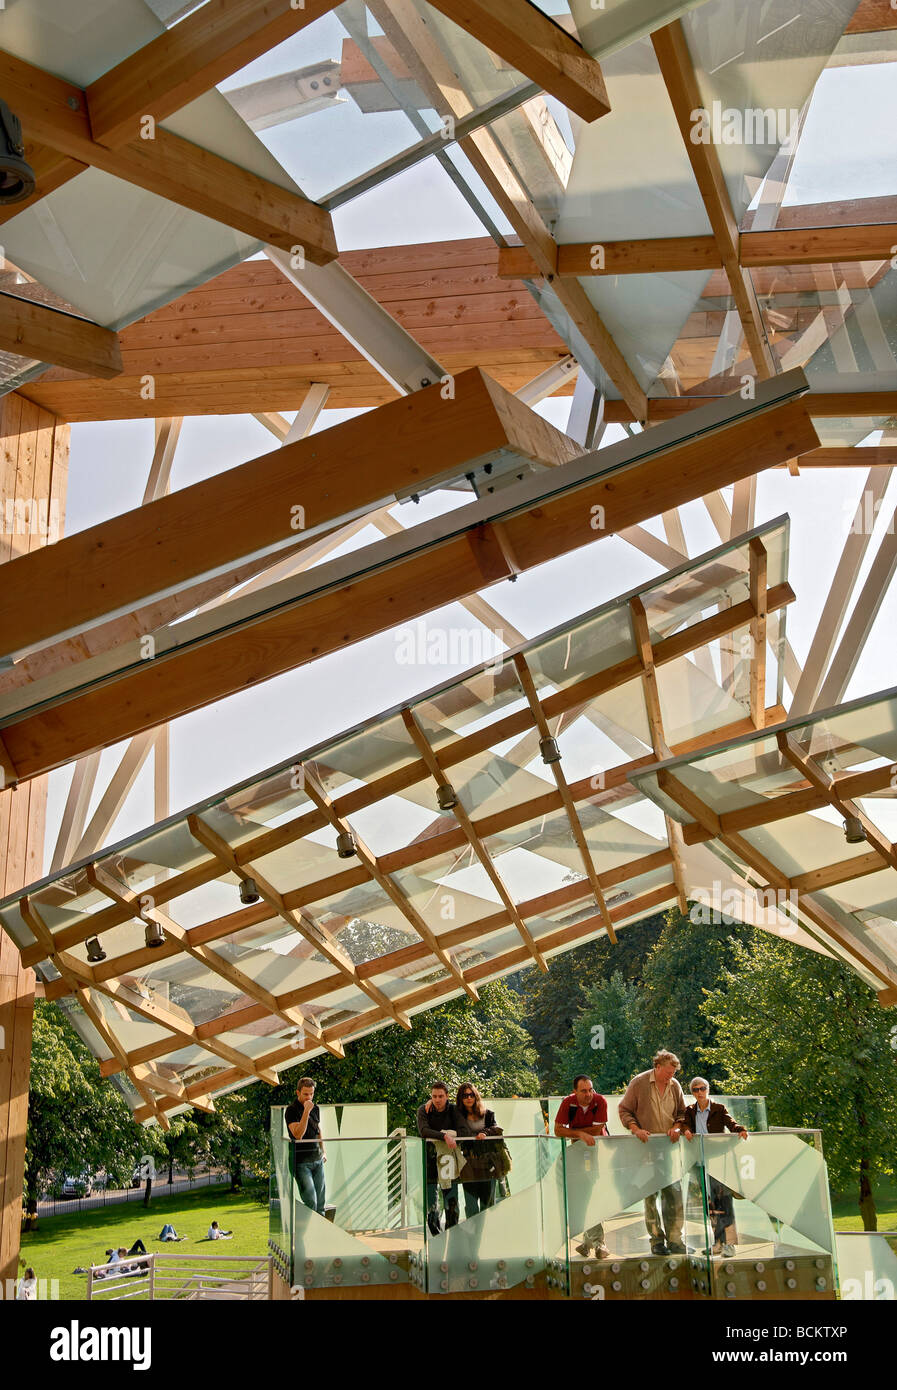 Pavillon 2008 entworfen von Frank Gehry Kensington Park London Stockbild